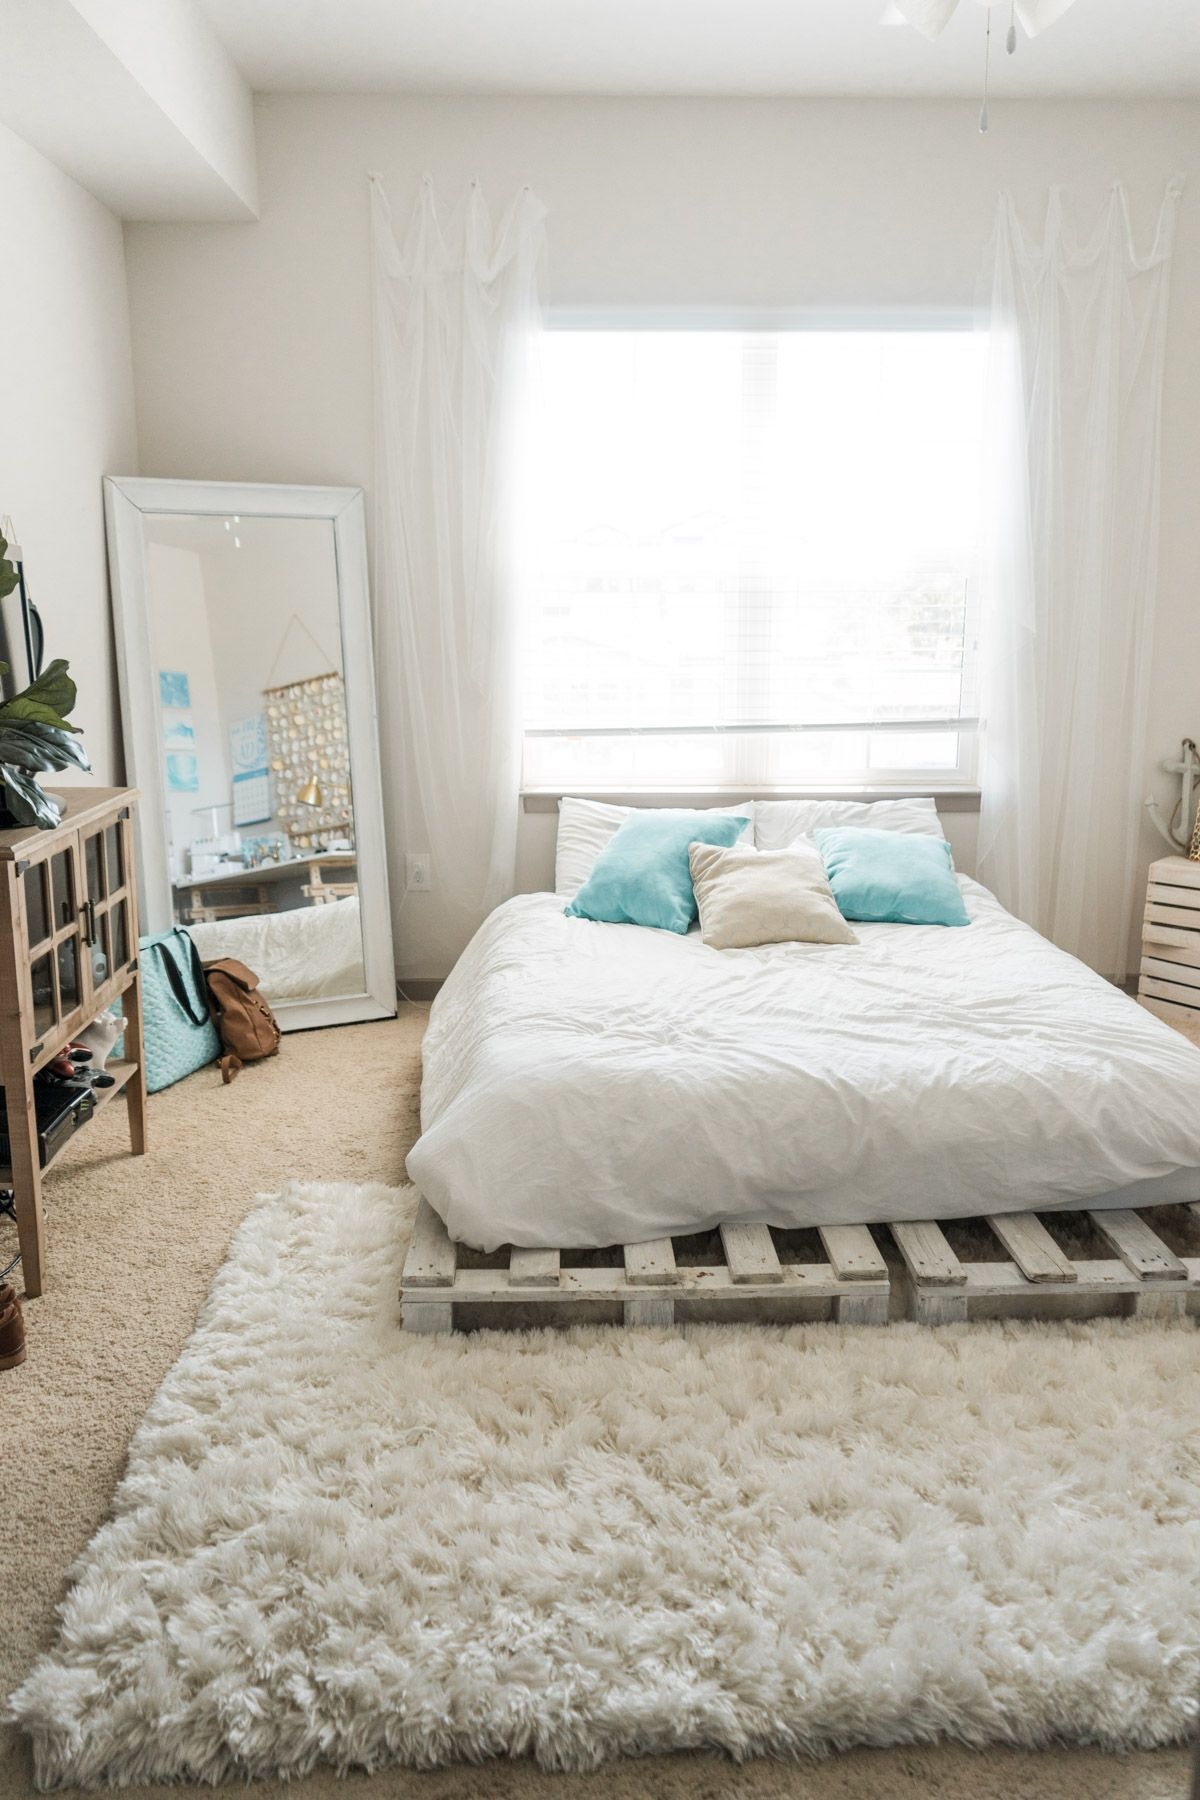 Beachy Boho Bedroom & Office   Room ideas bedroom, Bedroom ... on Modern Boho Bed Frame  id=12901